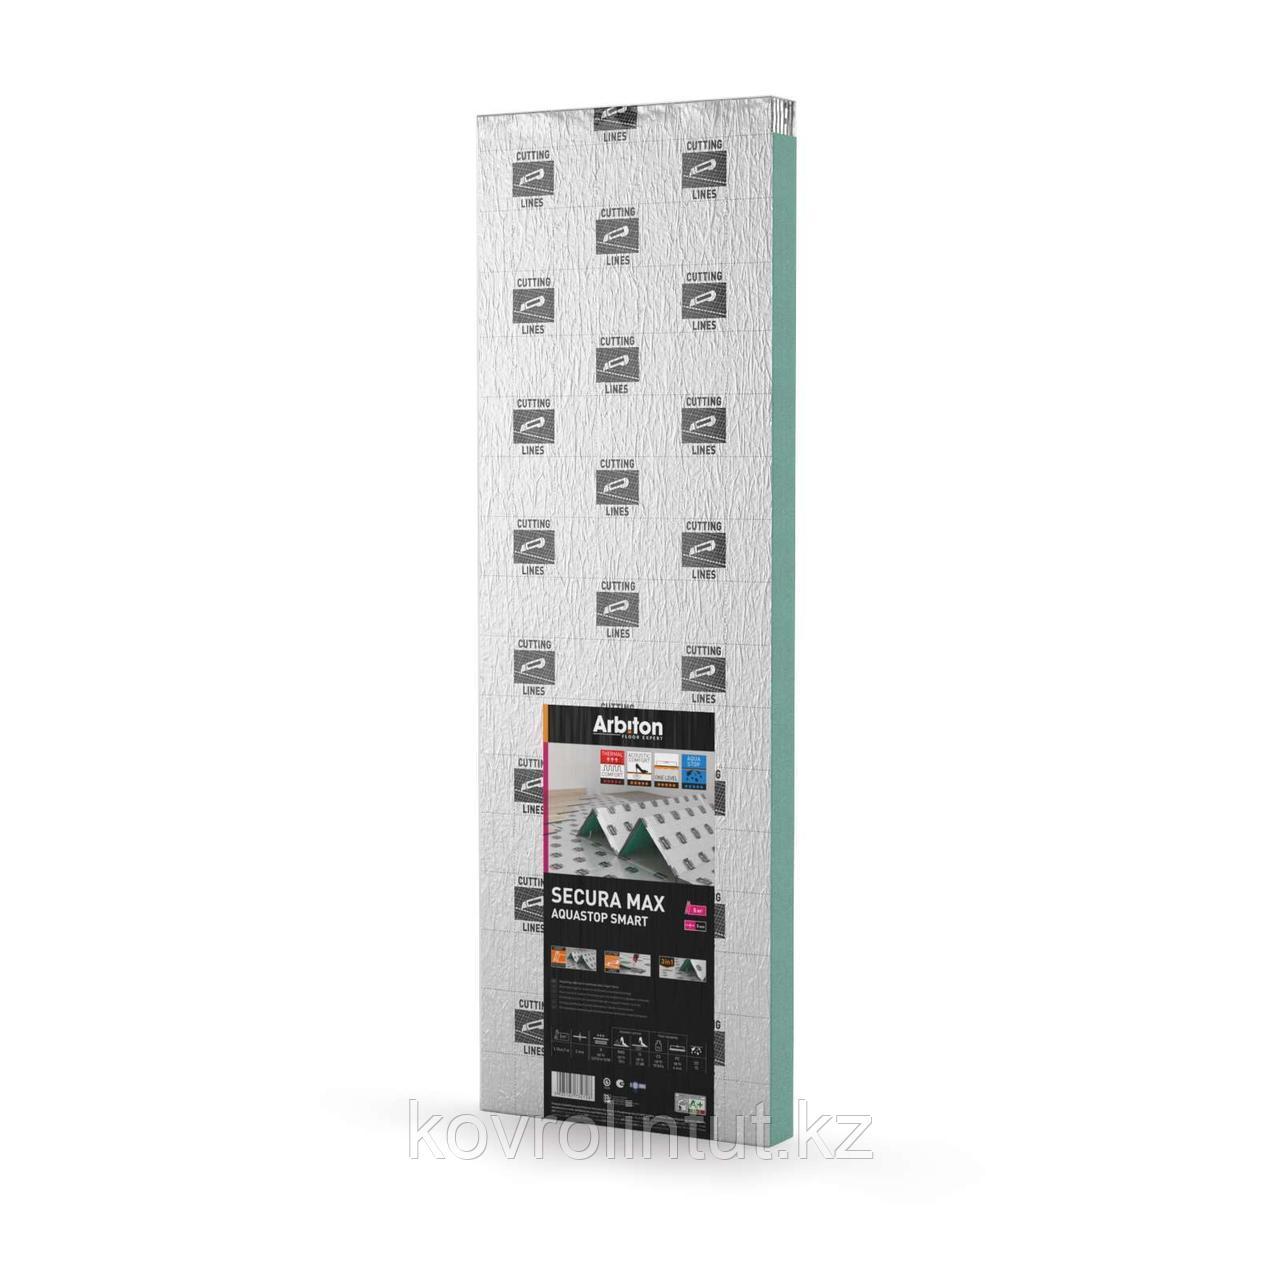 Подложка Arbiton Secura Max Aquastop Smart 5мм 1,18х4,7 м (5,5м2/уп)